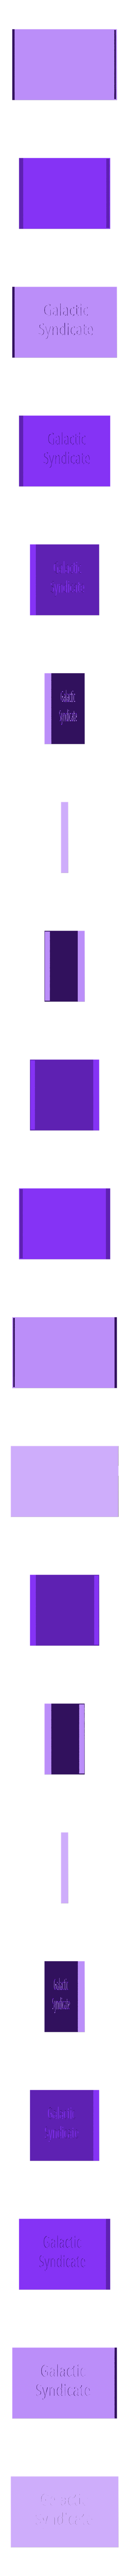 Nexus_Ops_-_Red_Lid.stl Download free STL file Nexus Ops Insert Cases • 3D printing object, Hardcore3D